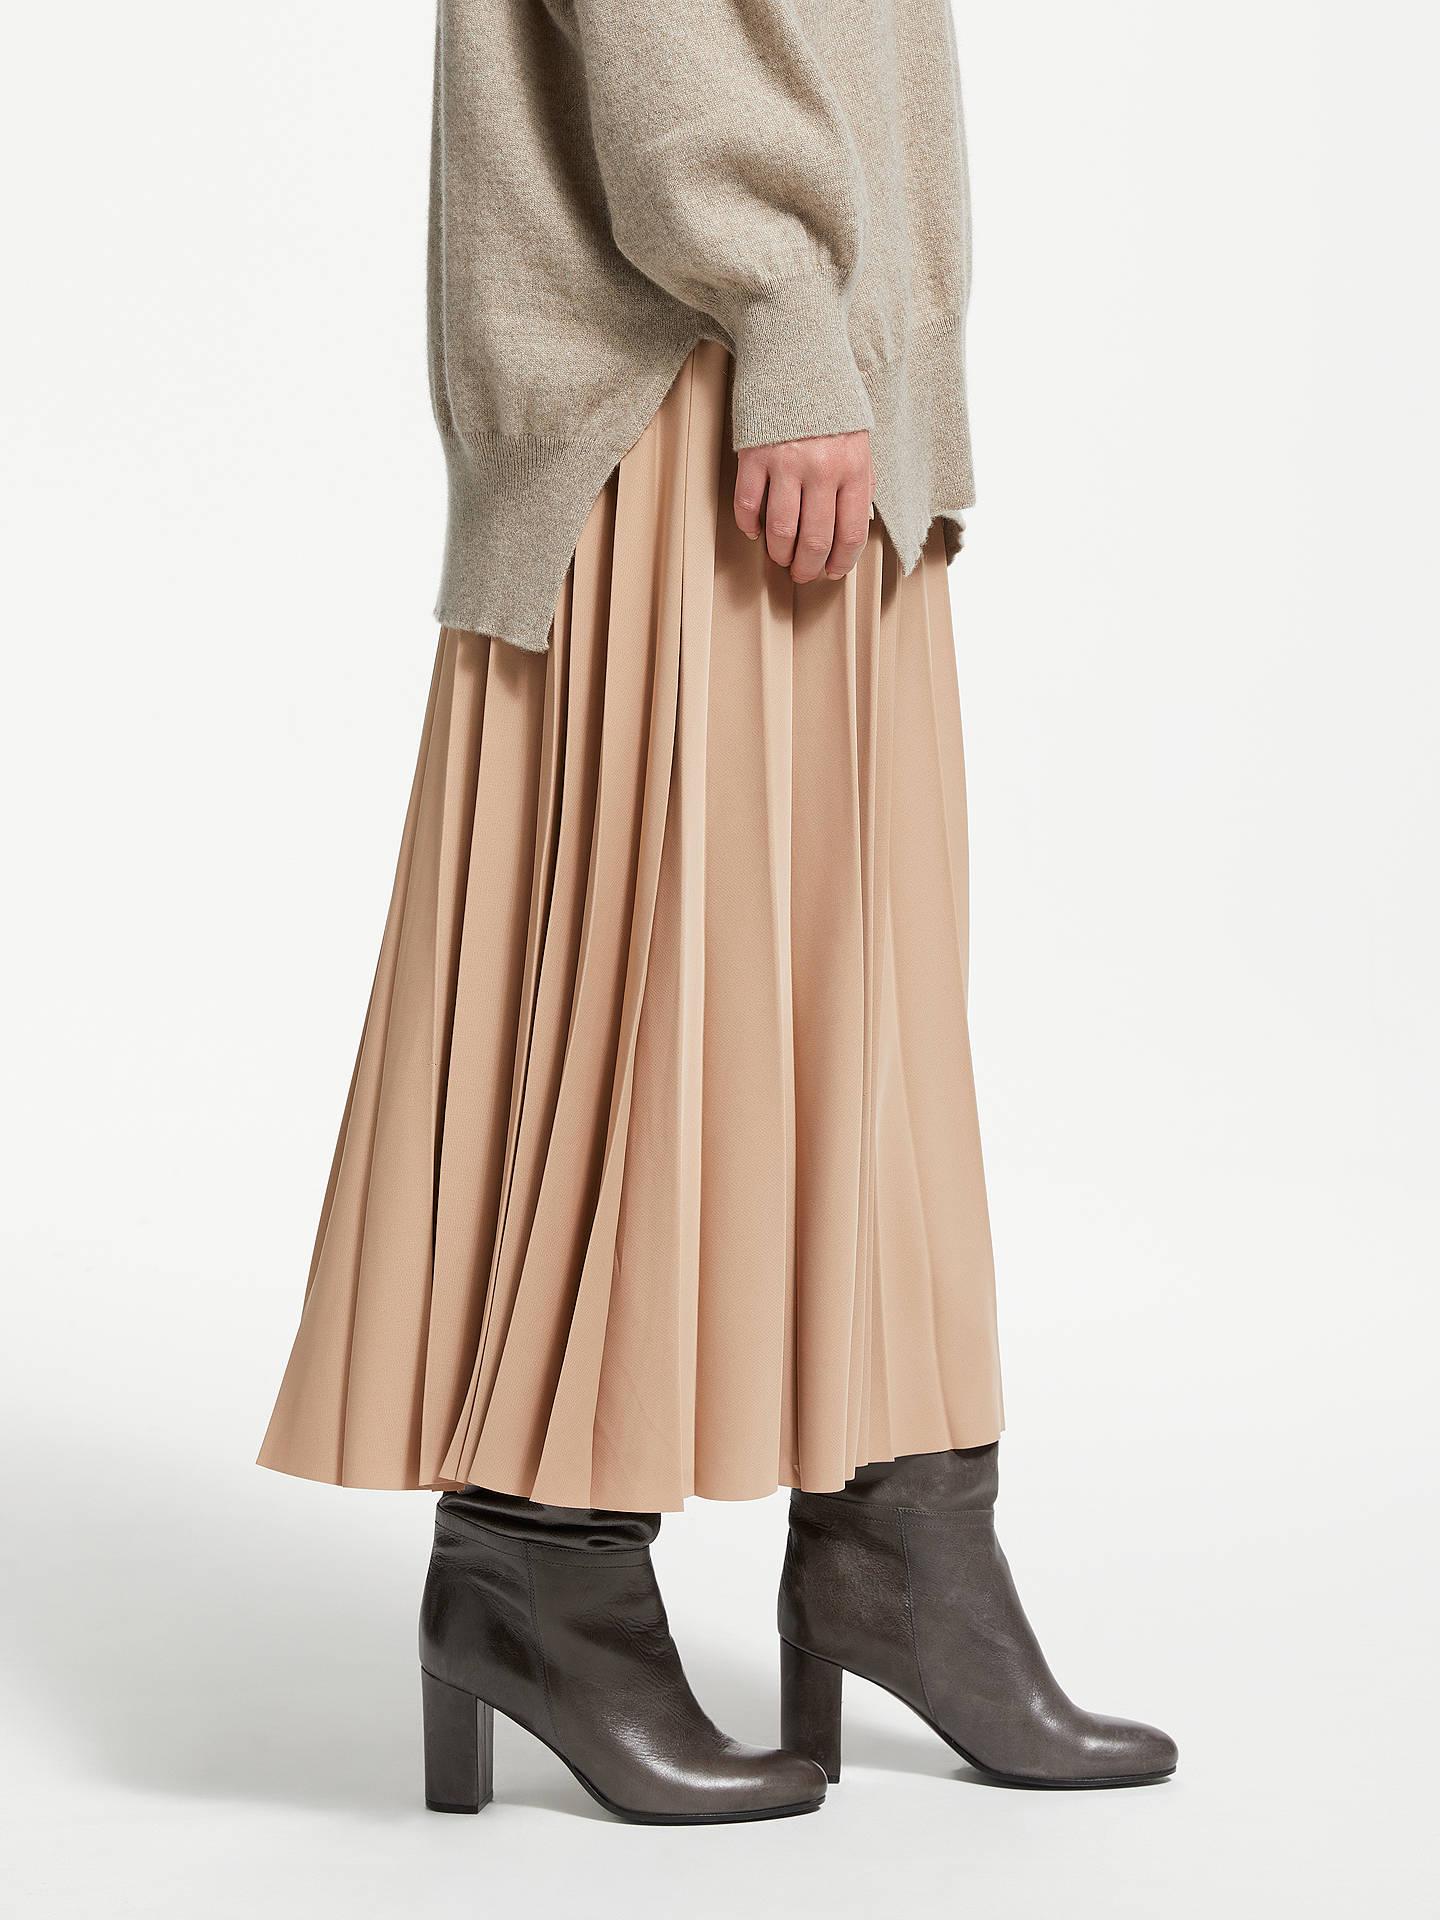 c0337429c Buy Modern Rarity Sunray Pleated Midi Skirt, Camel, 18 Online at  johnlewis.com ...